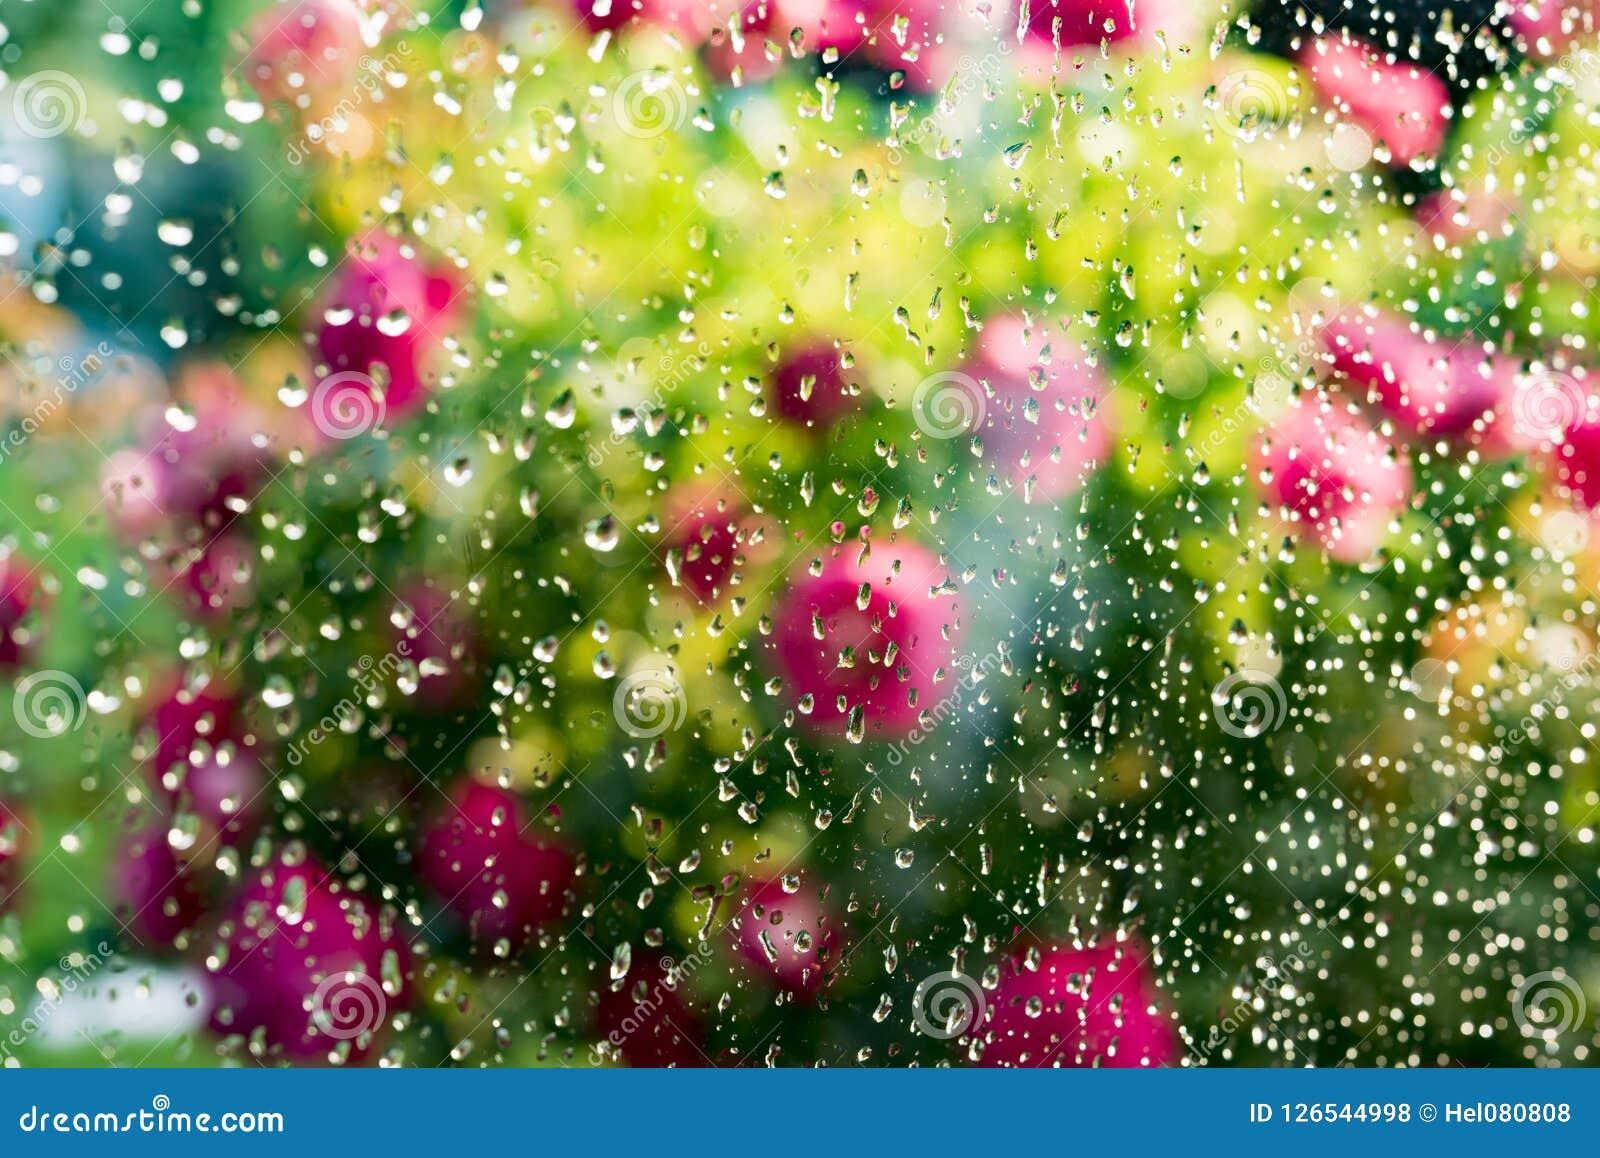 Summer rain on window. Blurred flowering rose bush behind glass of window with raindrops